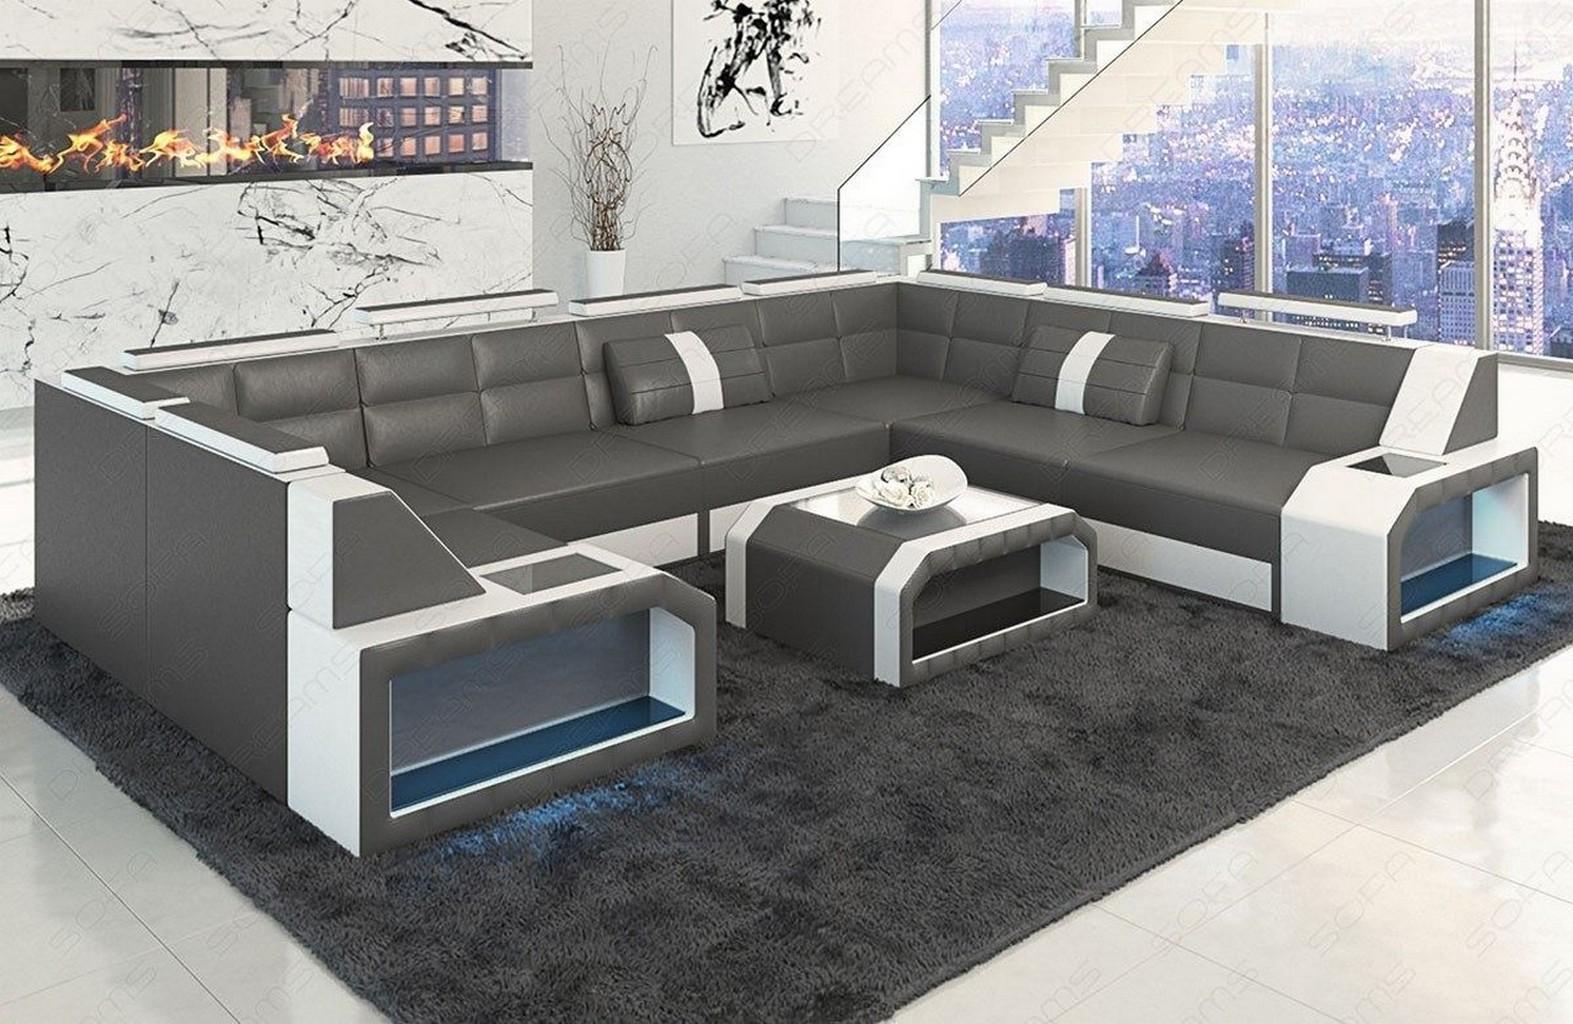 leather sofa design couch luxury set pesaro u shape led luxury corner sofa grey white ebay. Black Bedroom Furniture Sets. Home Design Ideas